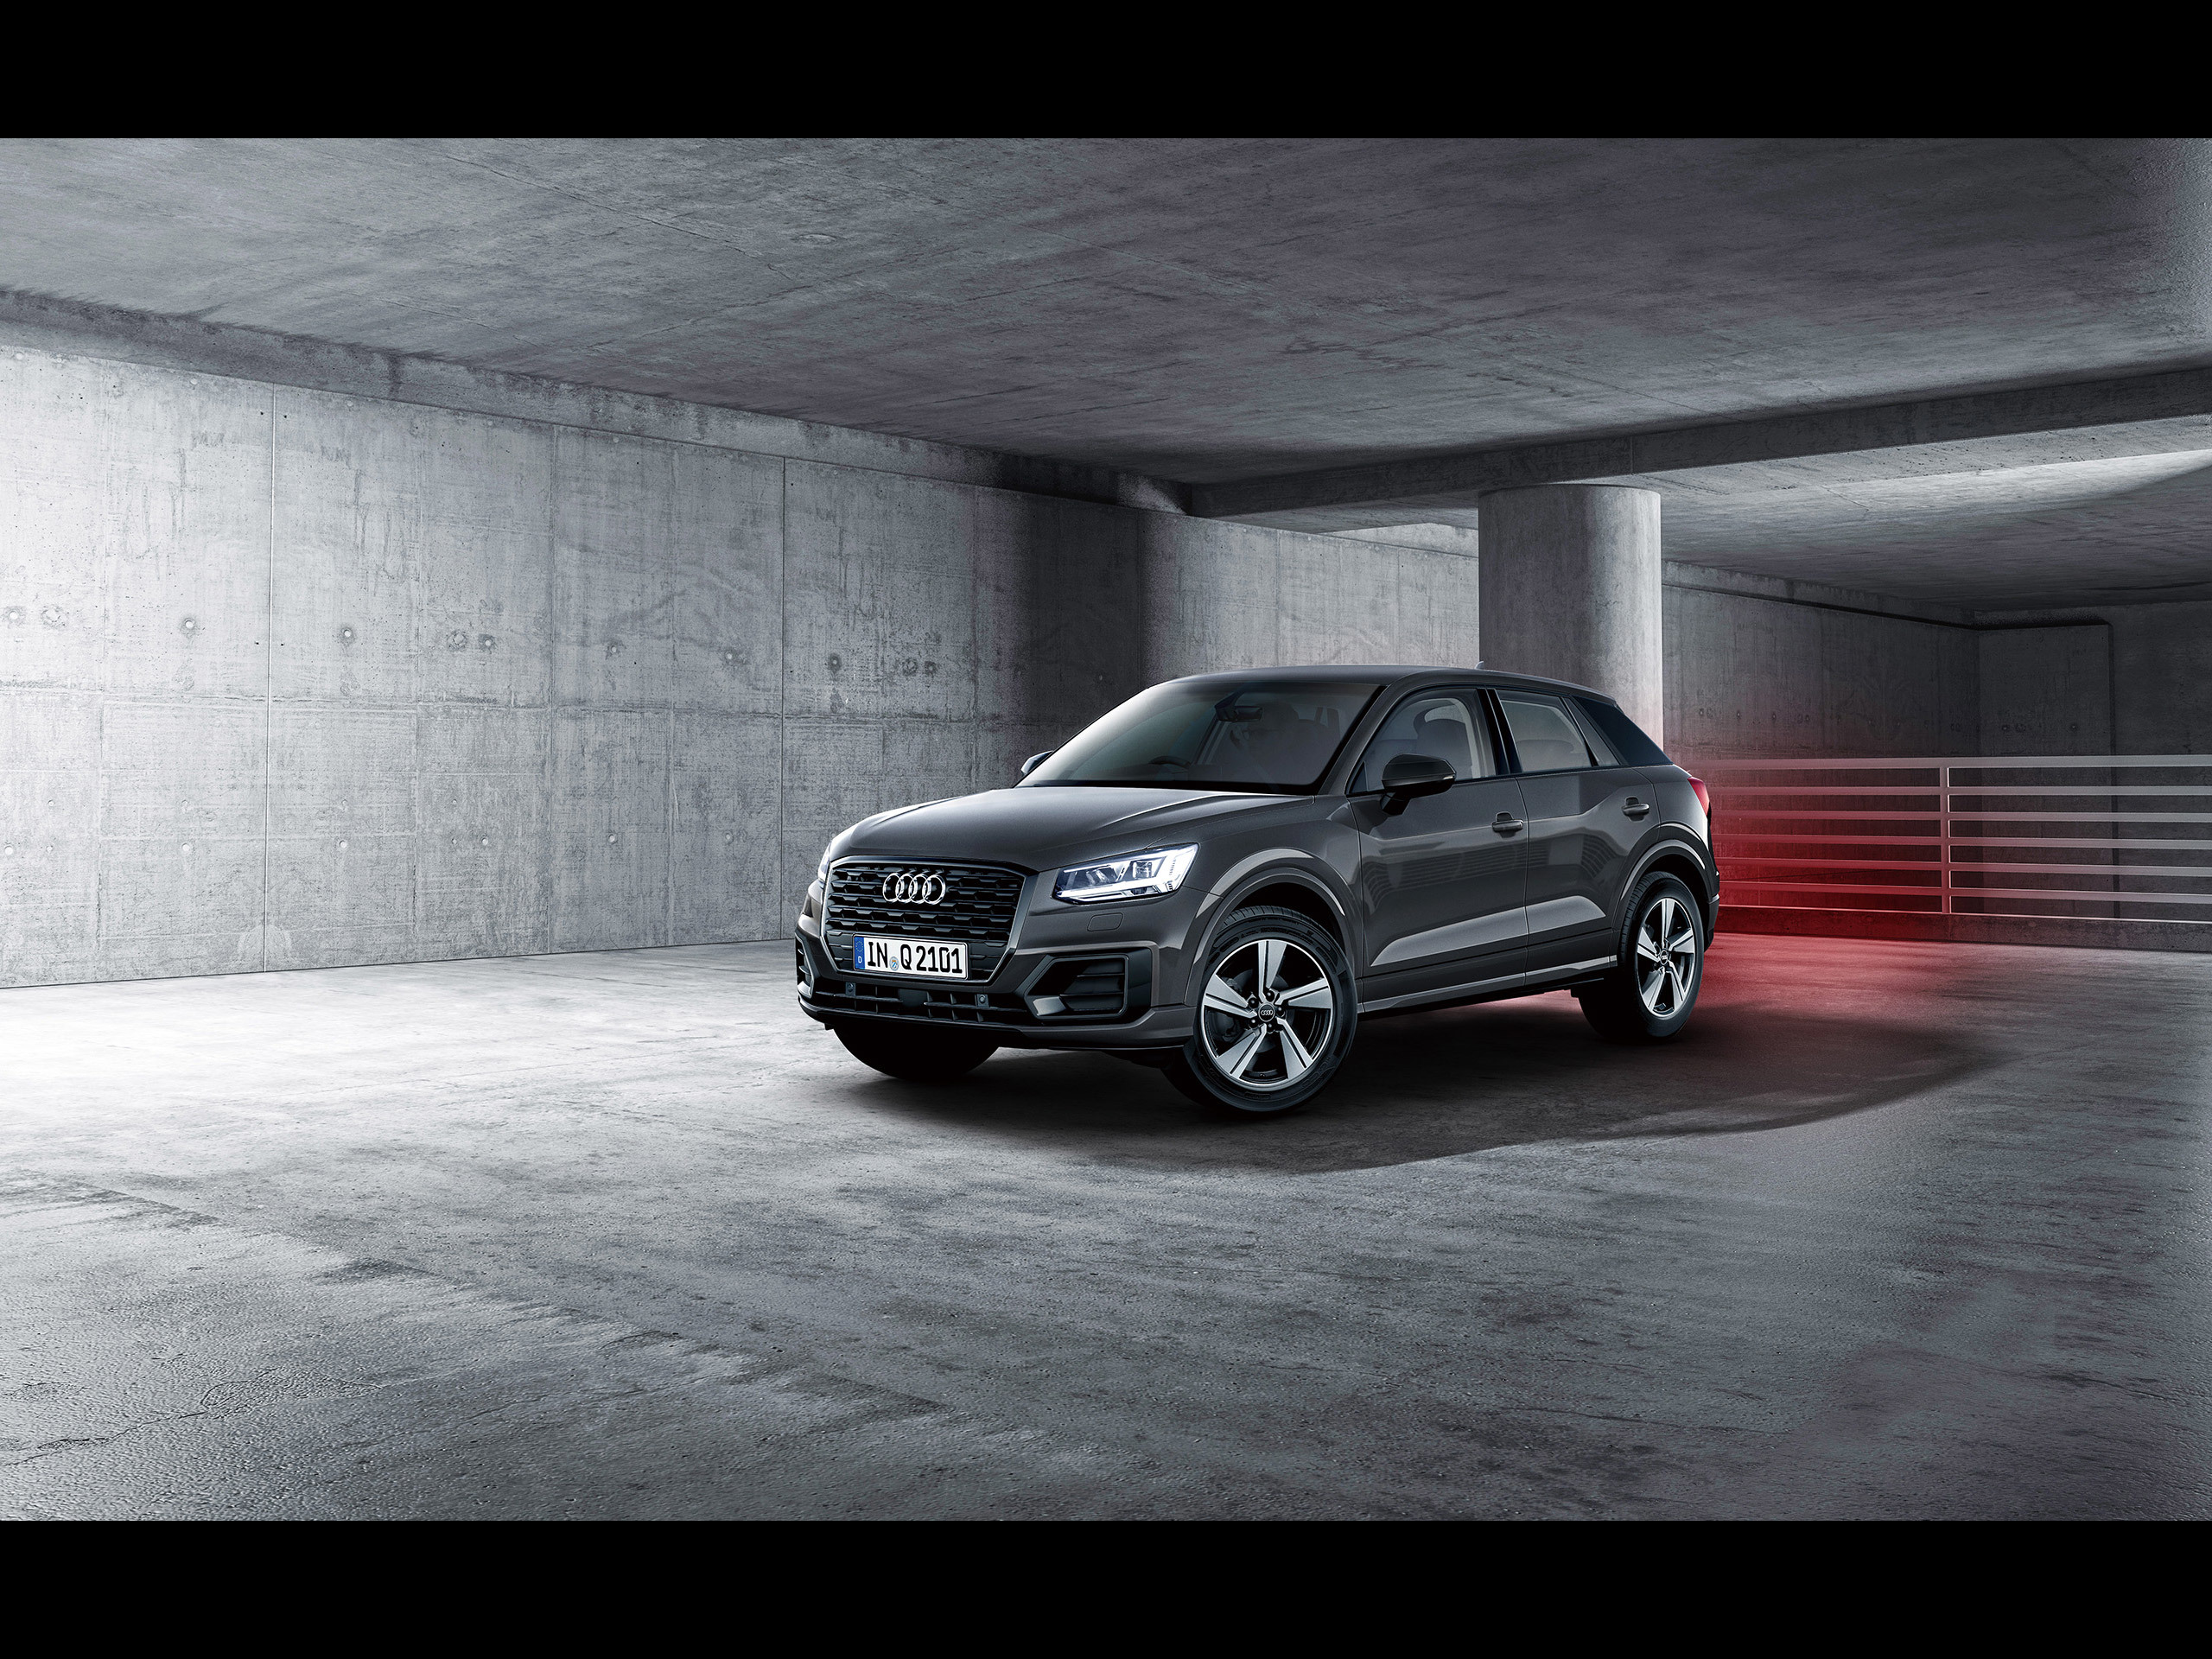 Audi Q2 アウディに嵌まる 壁紙画像ブログ